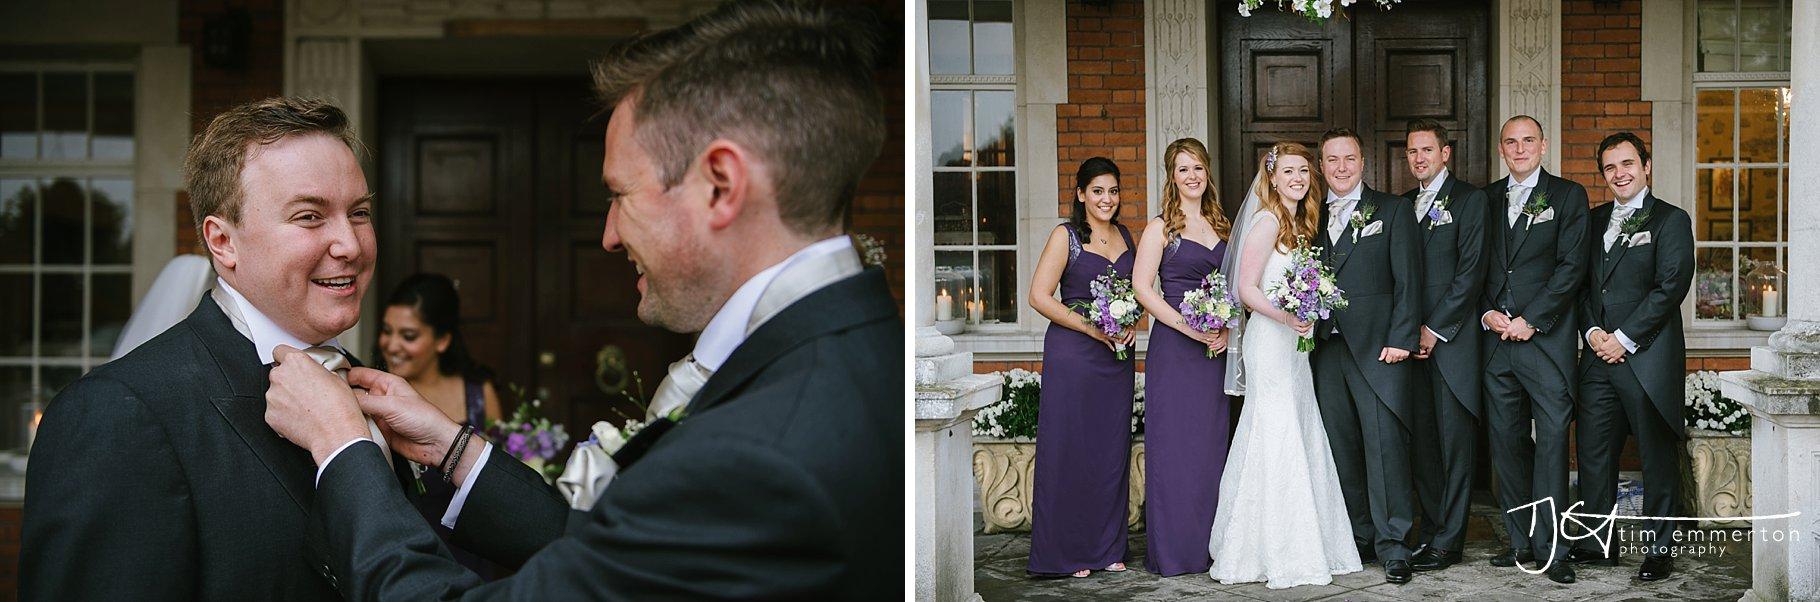 Eaves-Hall-Wedding-Photographer-067.jpg